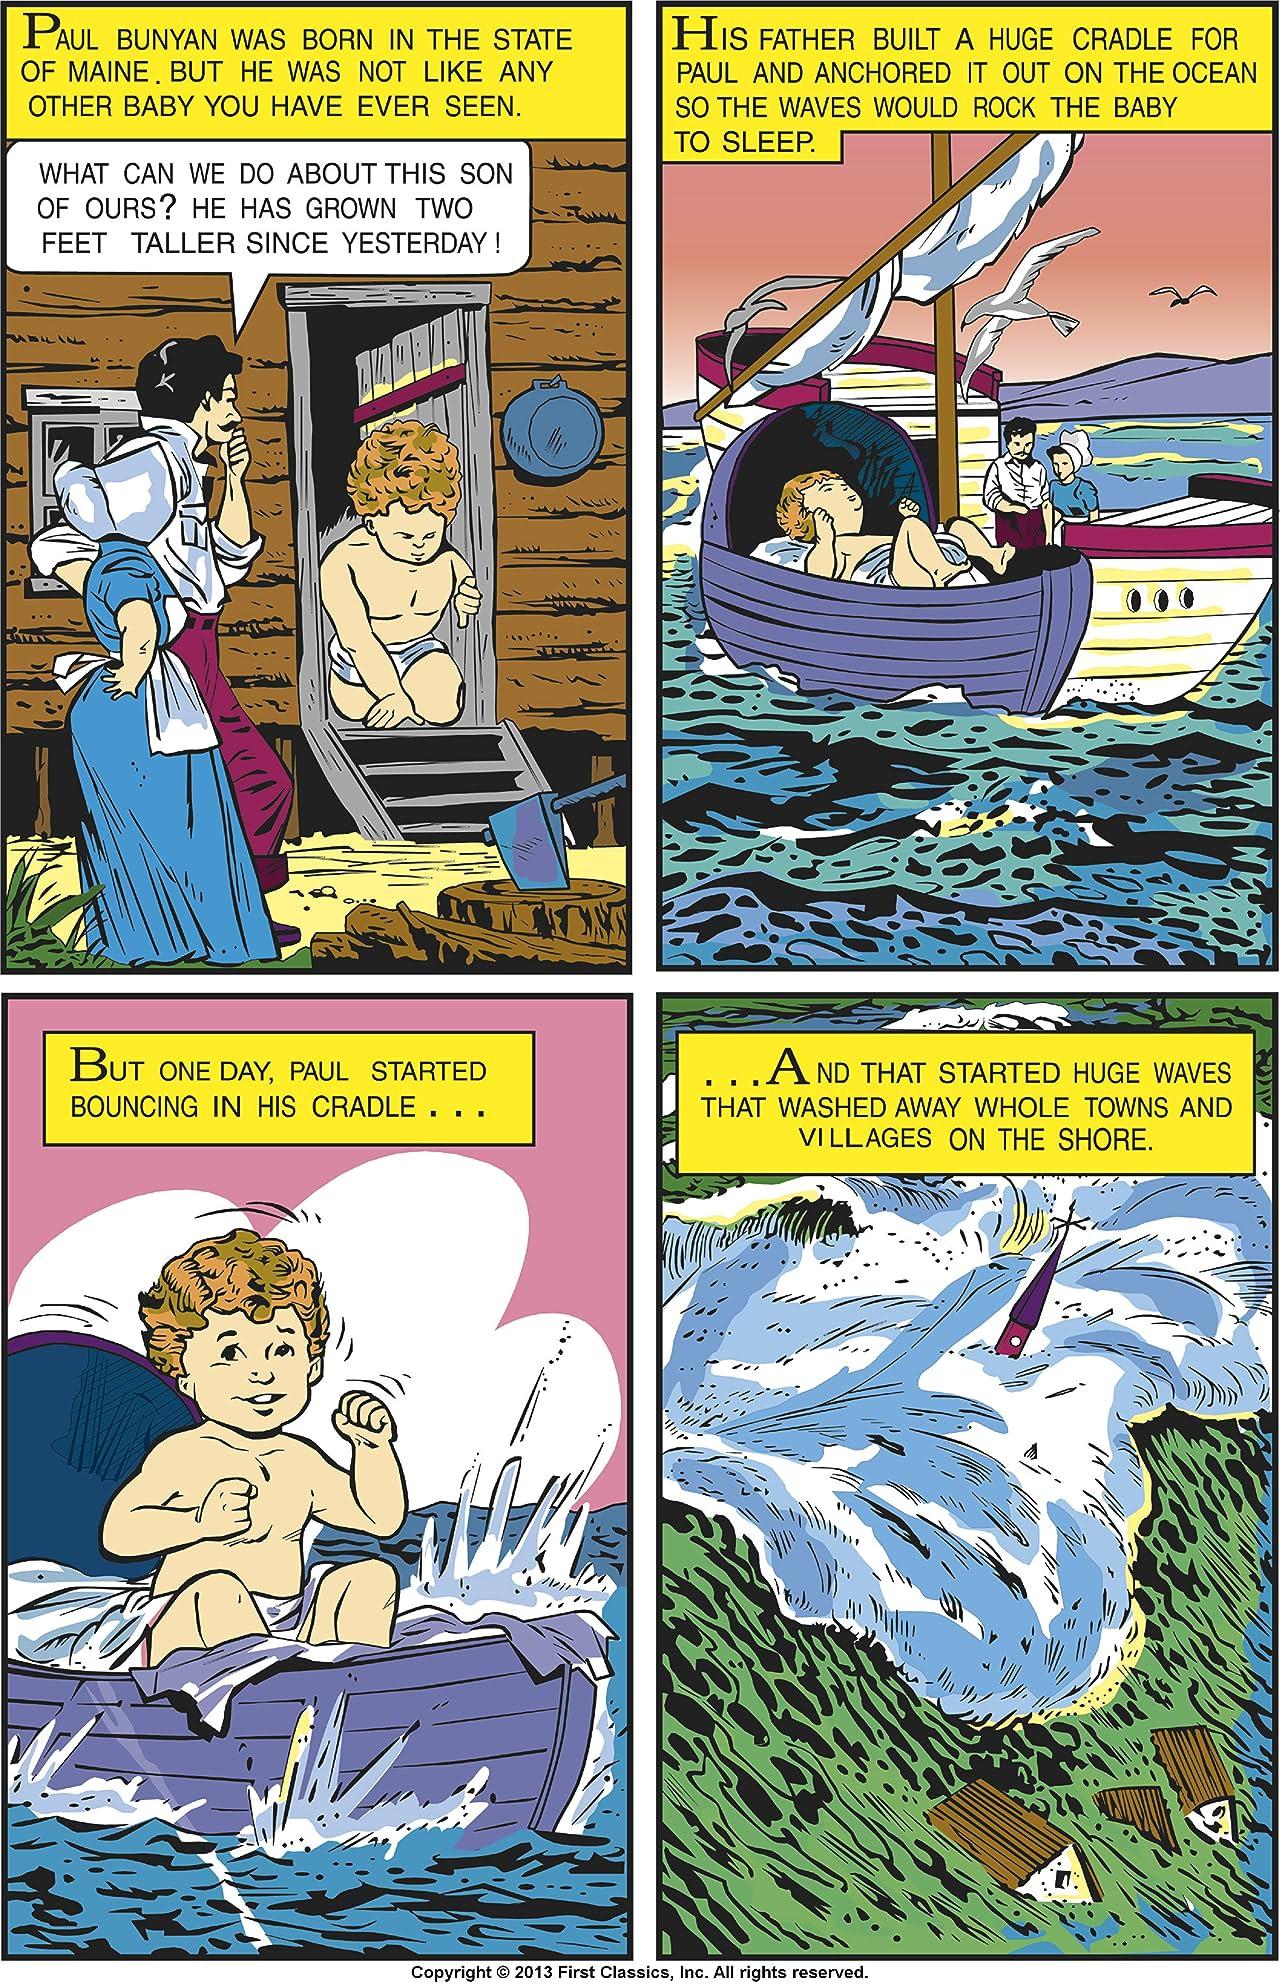 Classics Illustrated Junior #519: Paul Bunyan